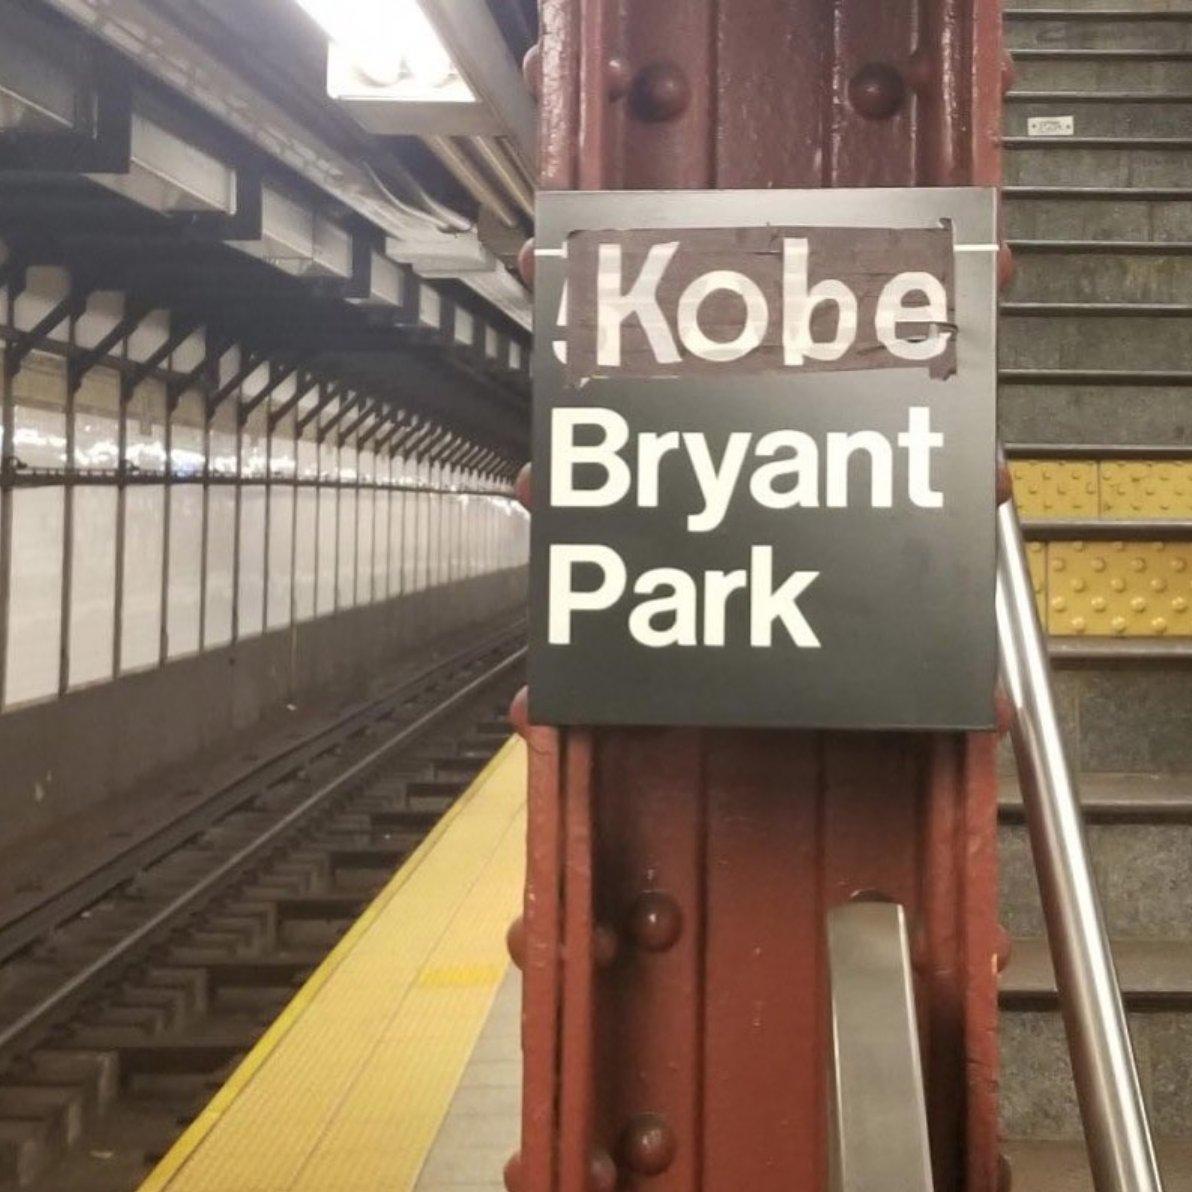 At Bryant Park station today in NYC (via @davidchang)